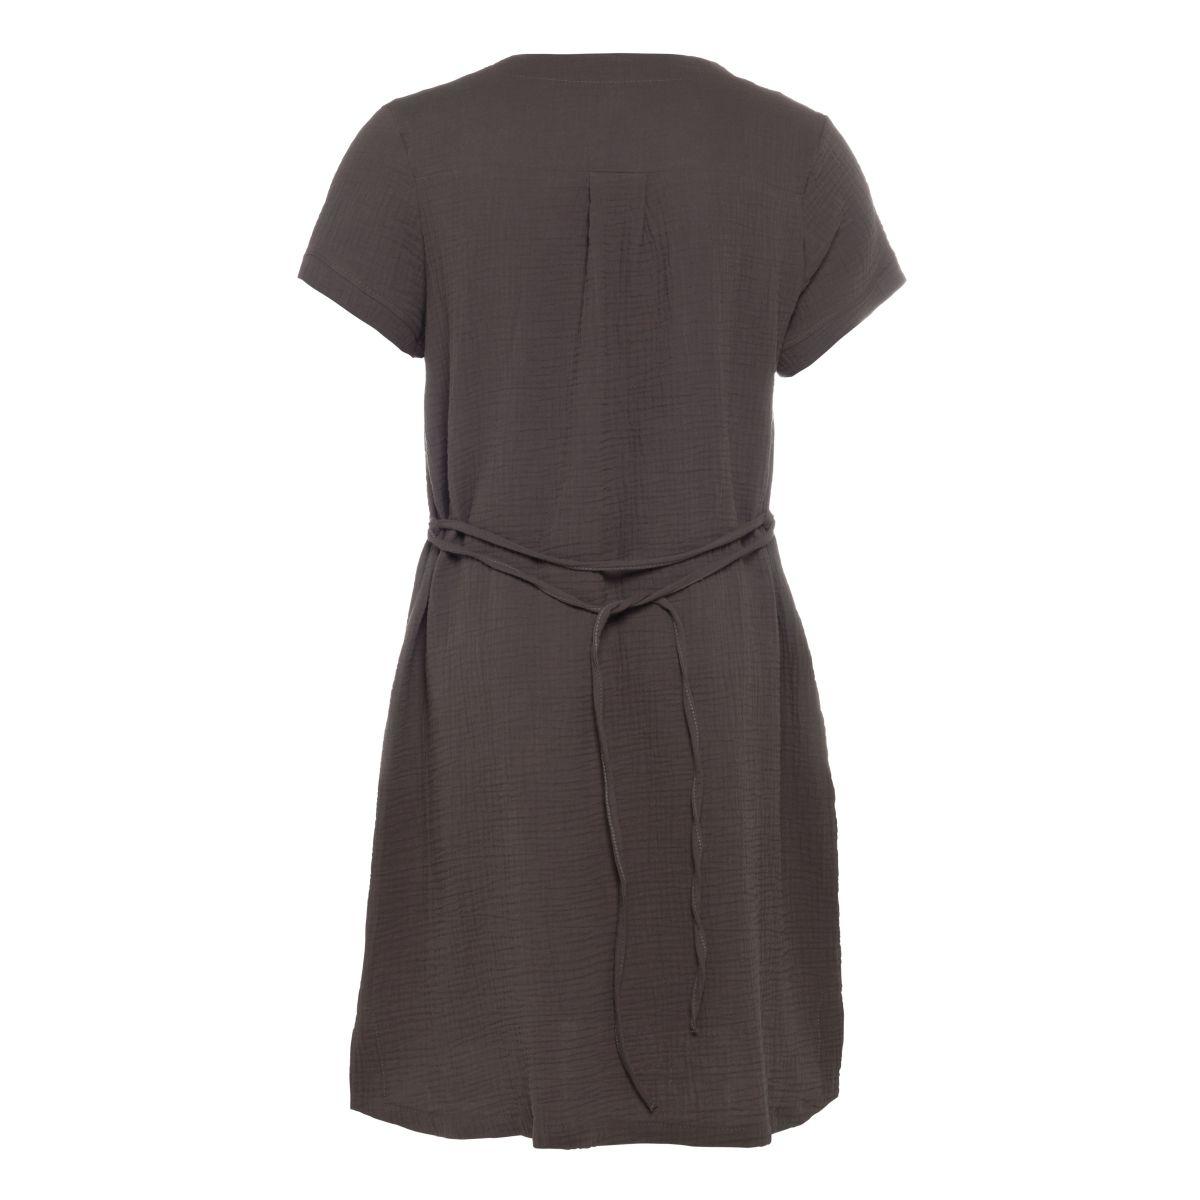 knit factory kf15012001051 indy jurk antraciet l 2